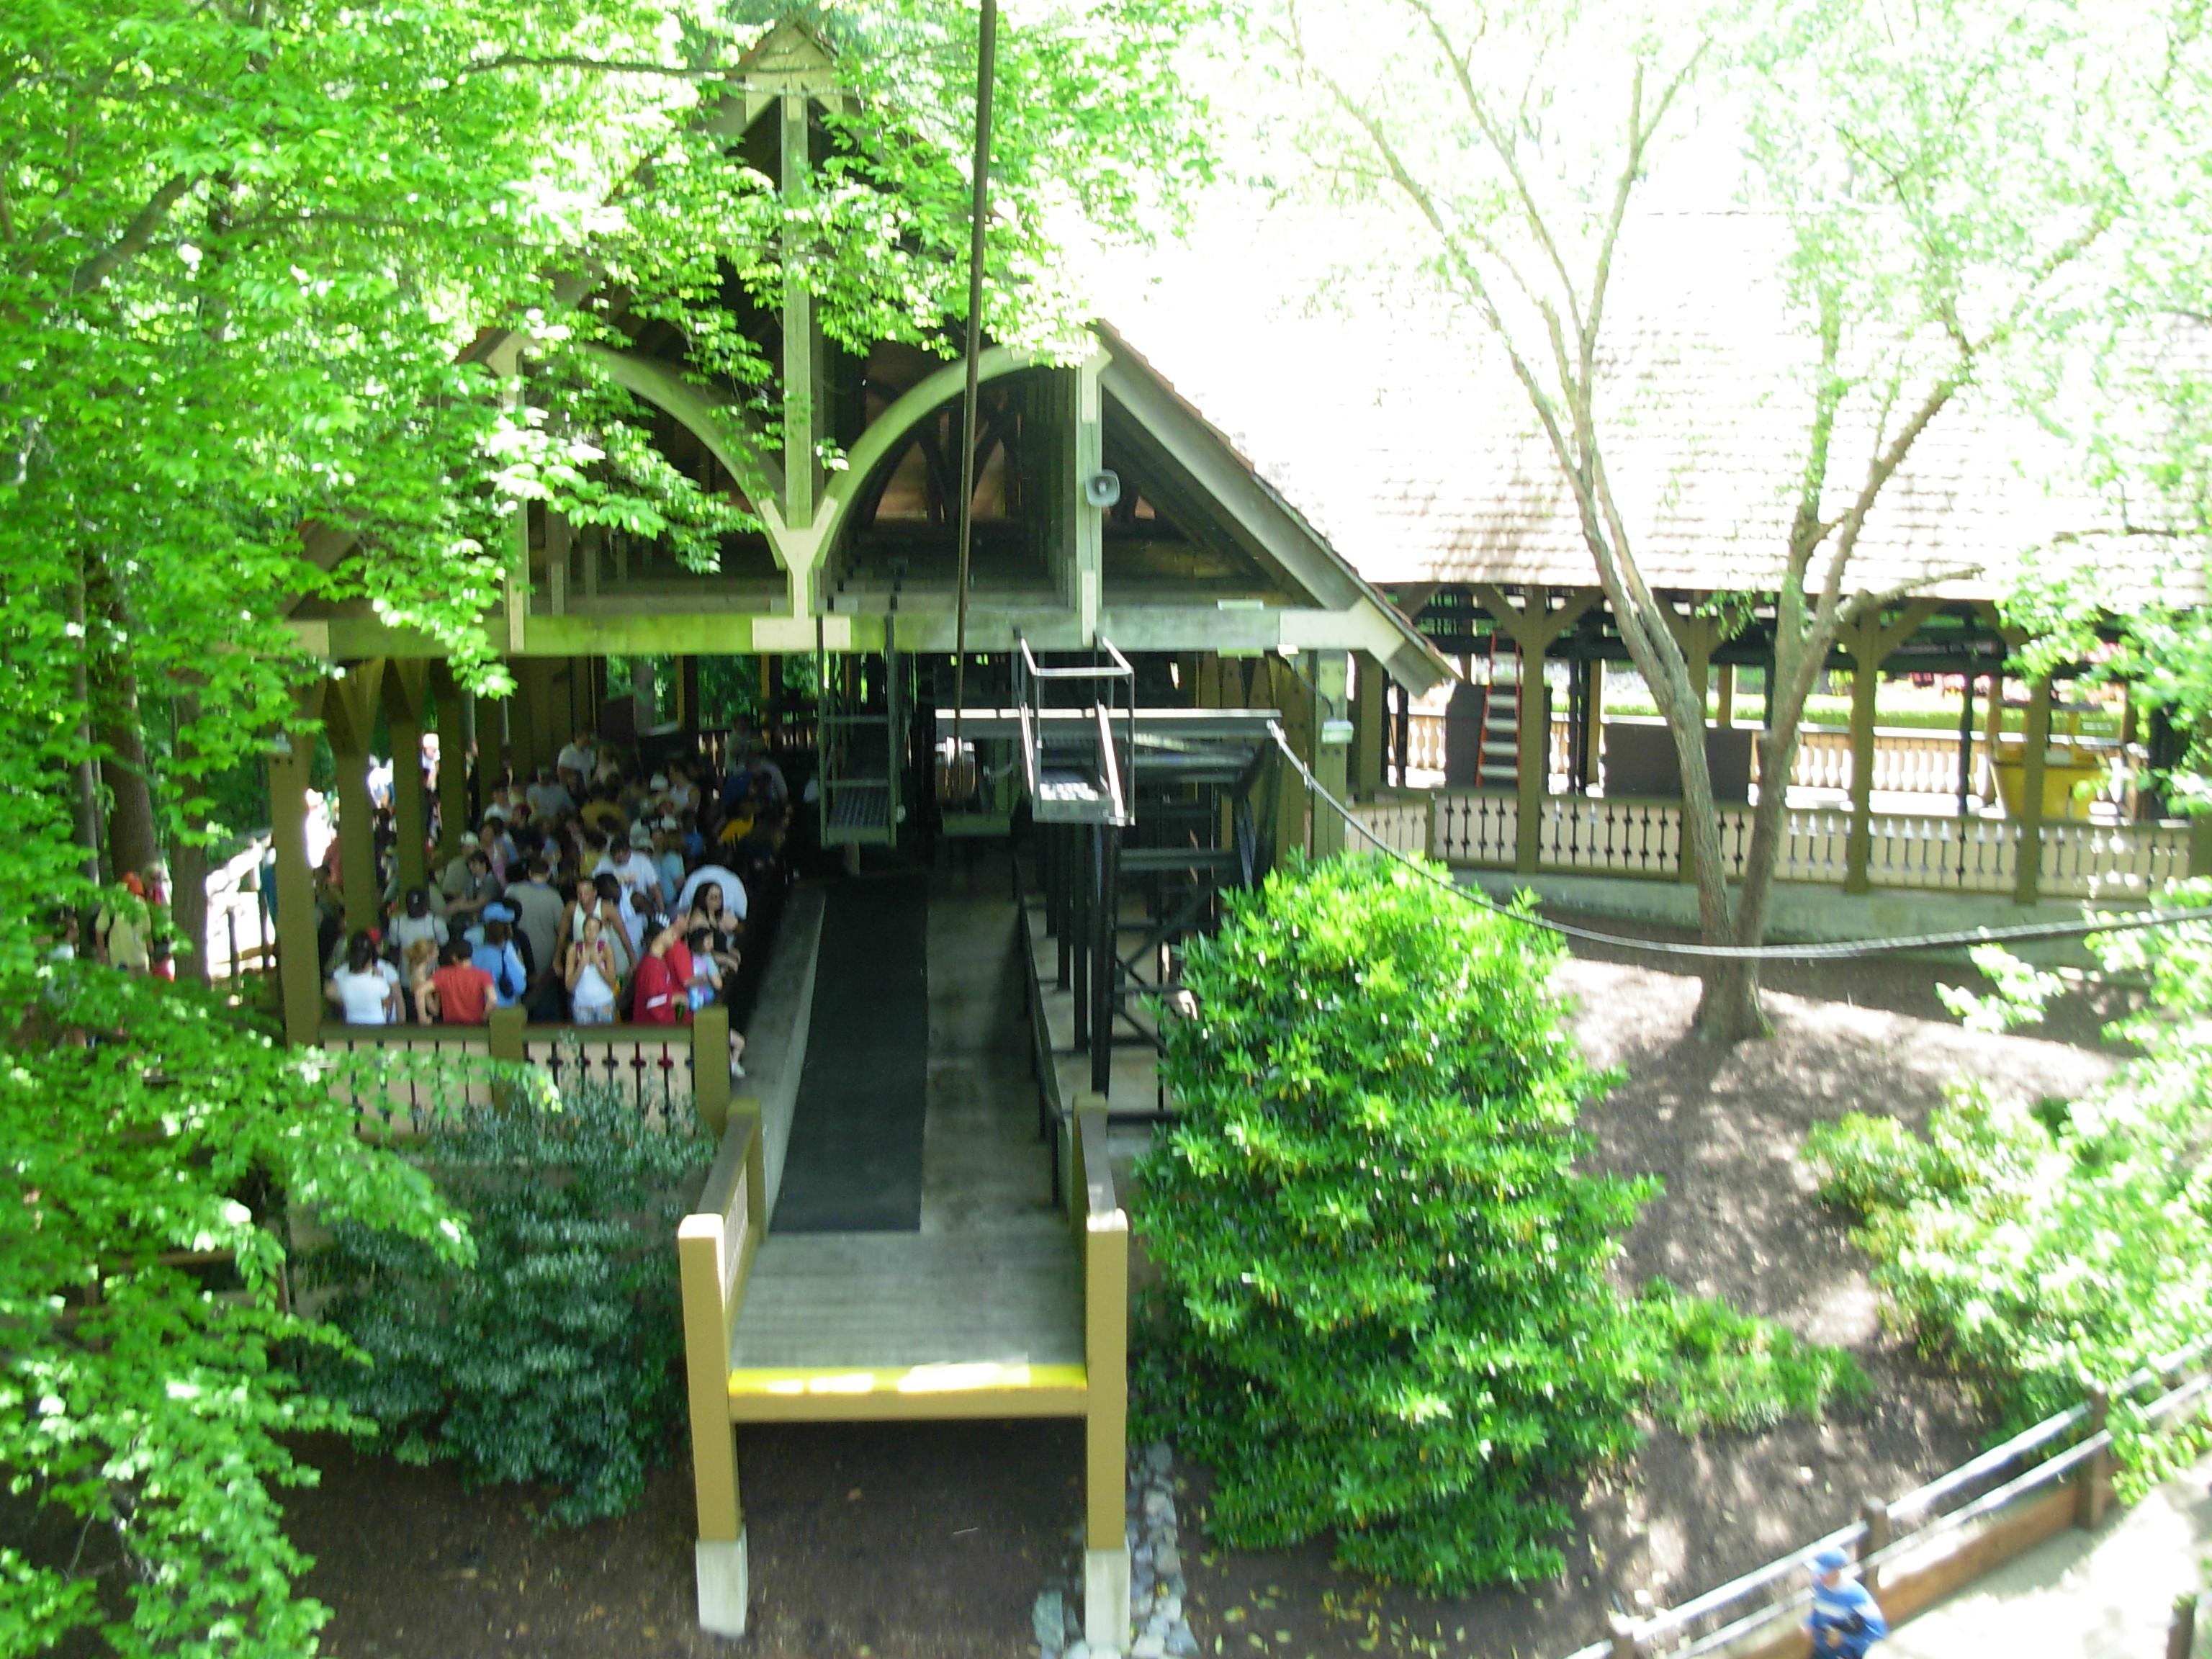 Genial File:Skyride 3 (Busch Gardens Williamsburg)